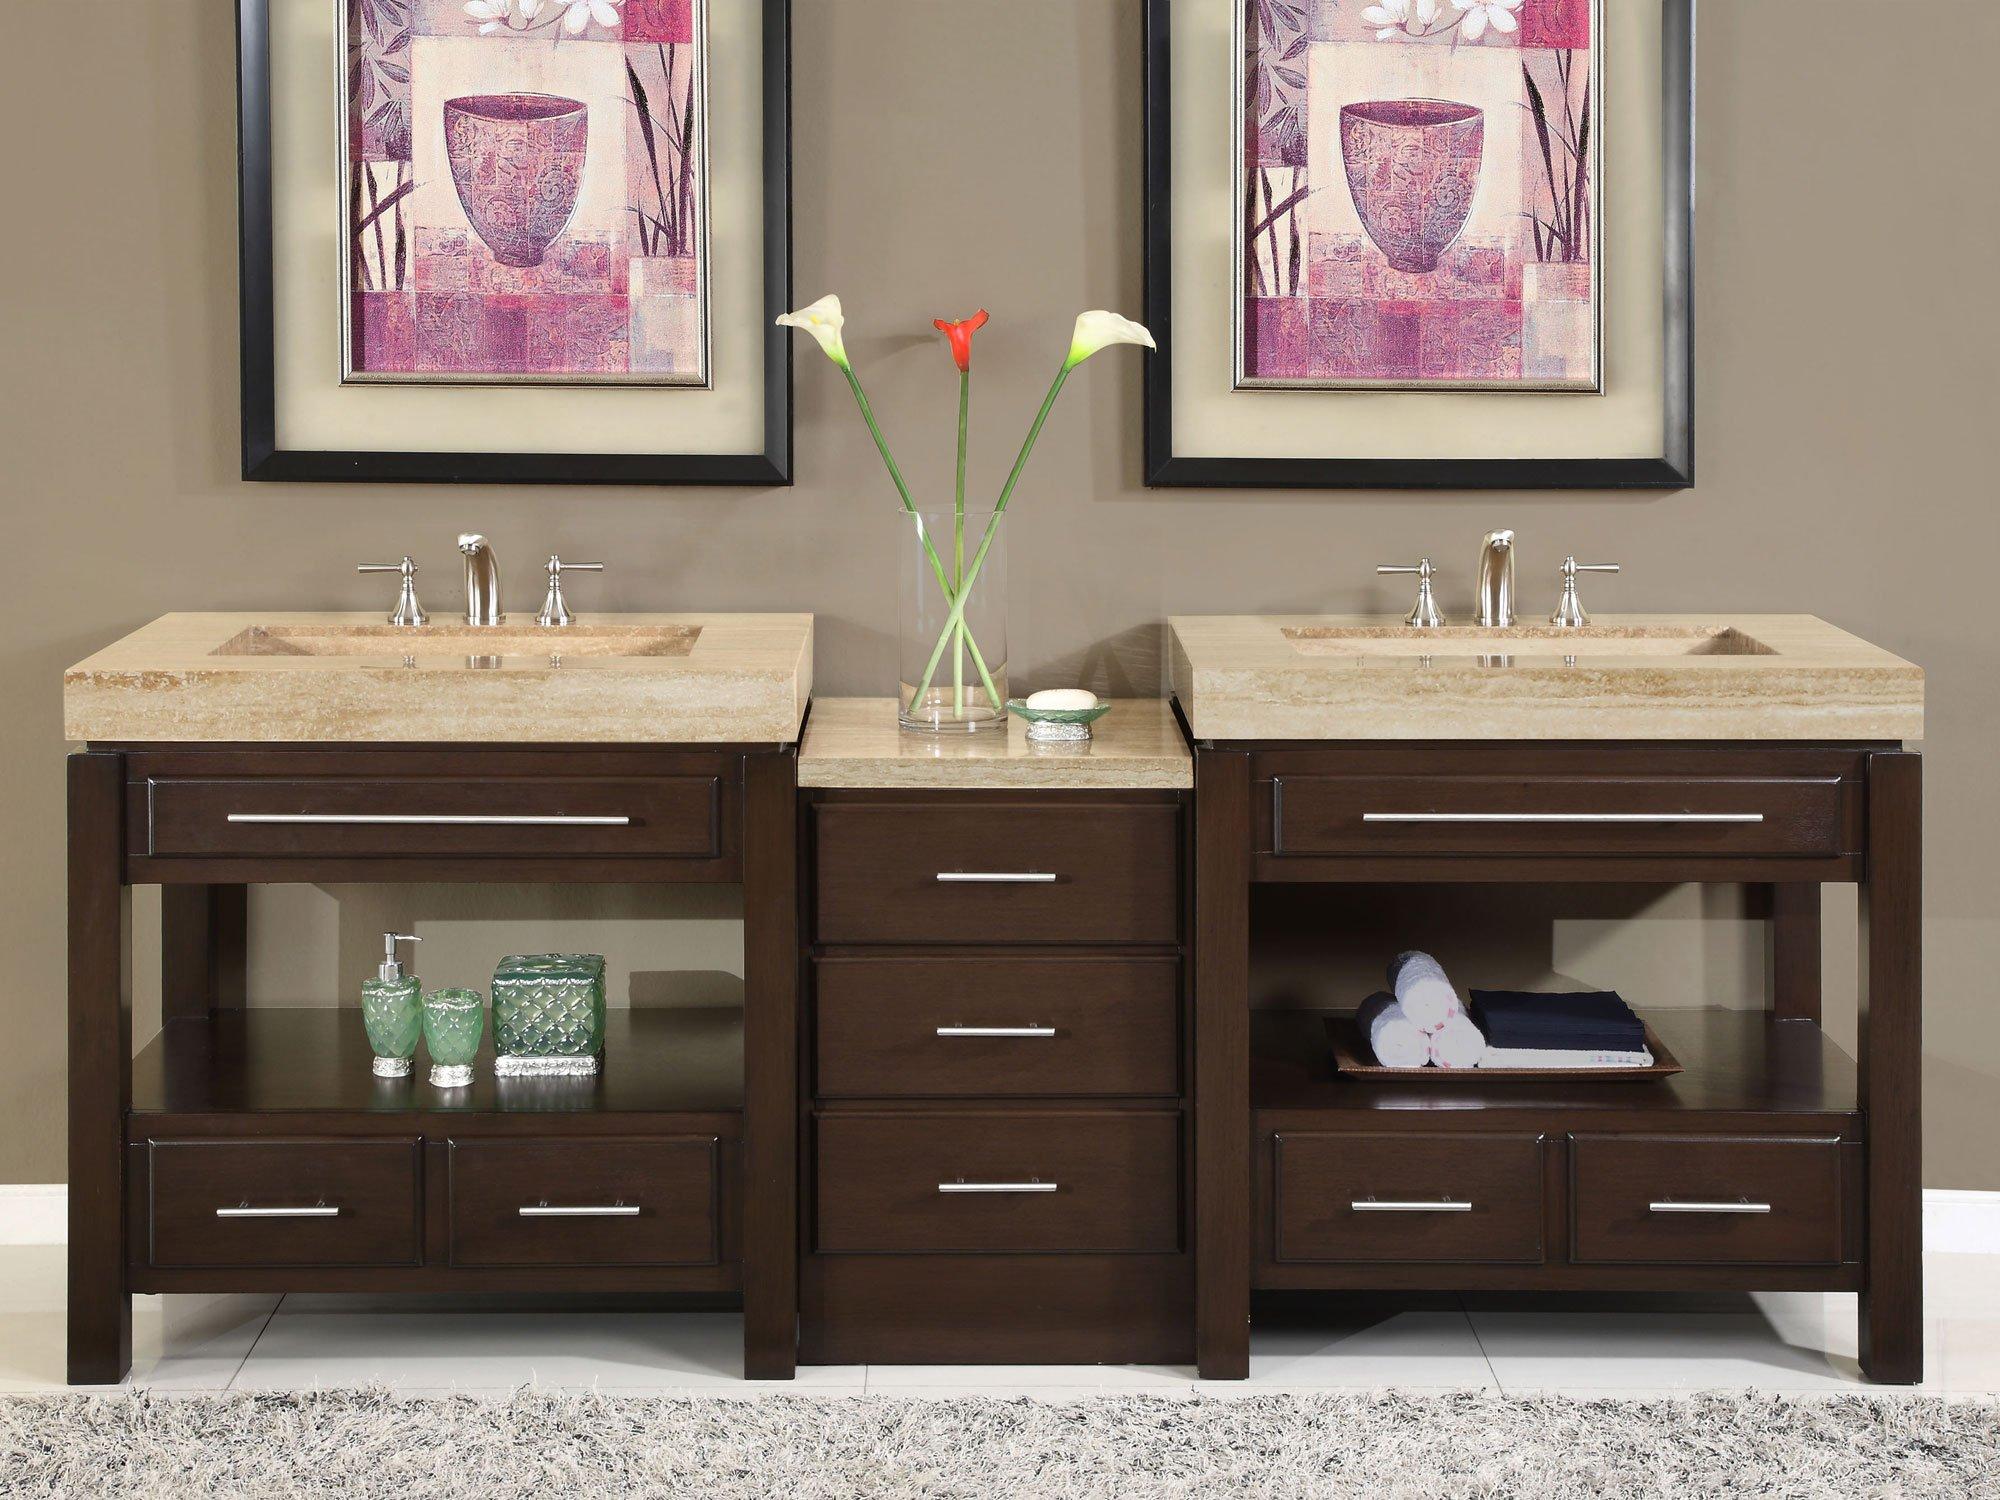 Silkroad Exclusive Countertop Travertine Stone Ramp Double Sink Bathroom Vanity with Cabinet, 92-Inch